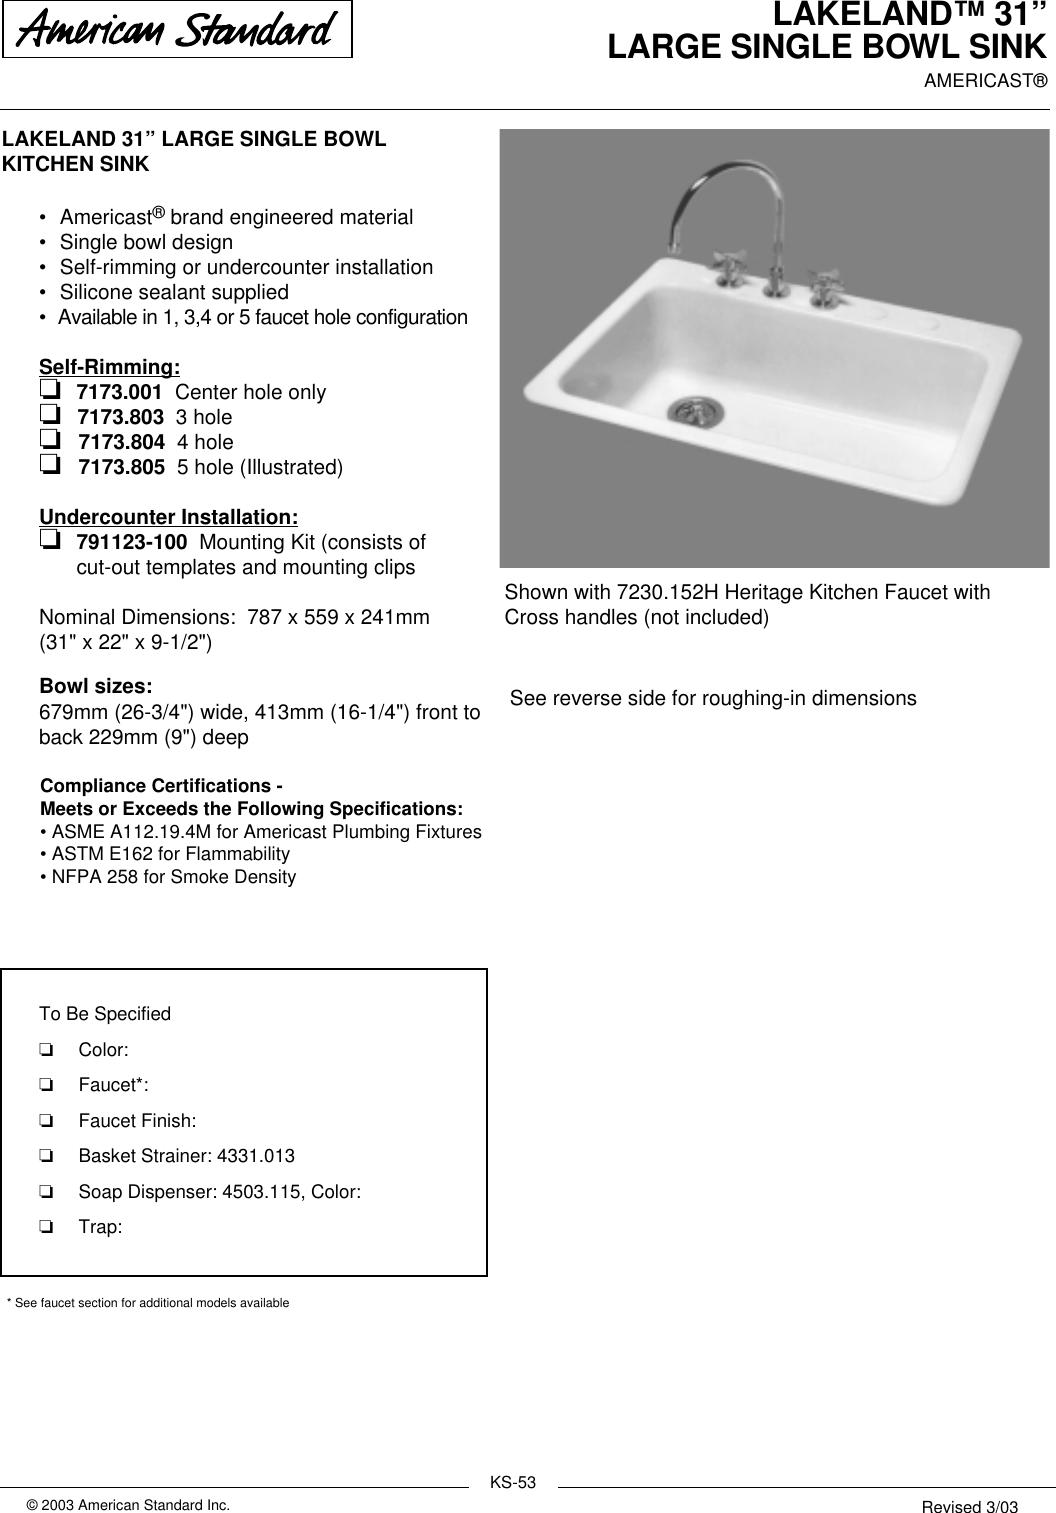 Page 1 of 2 - American-Standard American-Standard-Lakeland-31-Large-Single-Bowl-Sink-7173-001-Users-Manual- KITCHEN SINKS  American-standard-lakeland-31-large-single-bowl-sink-7173-001-users-manual